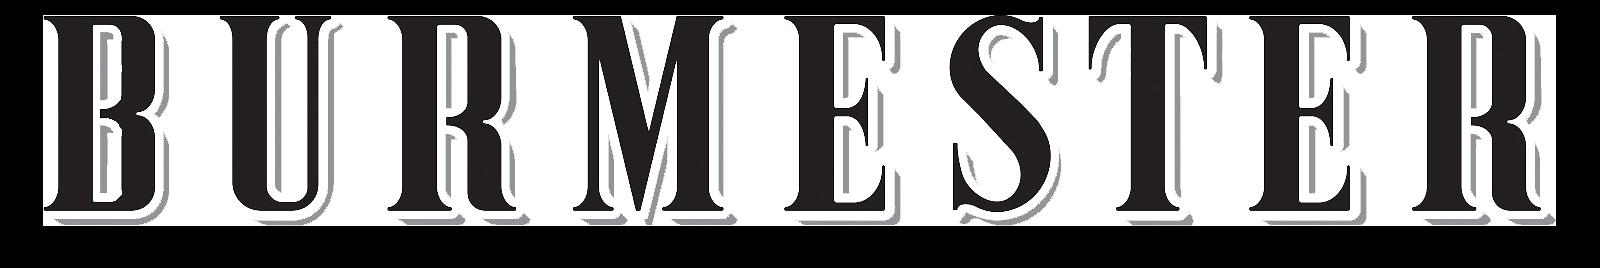 burmester-logo_clear.png